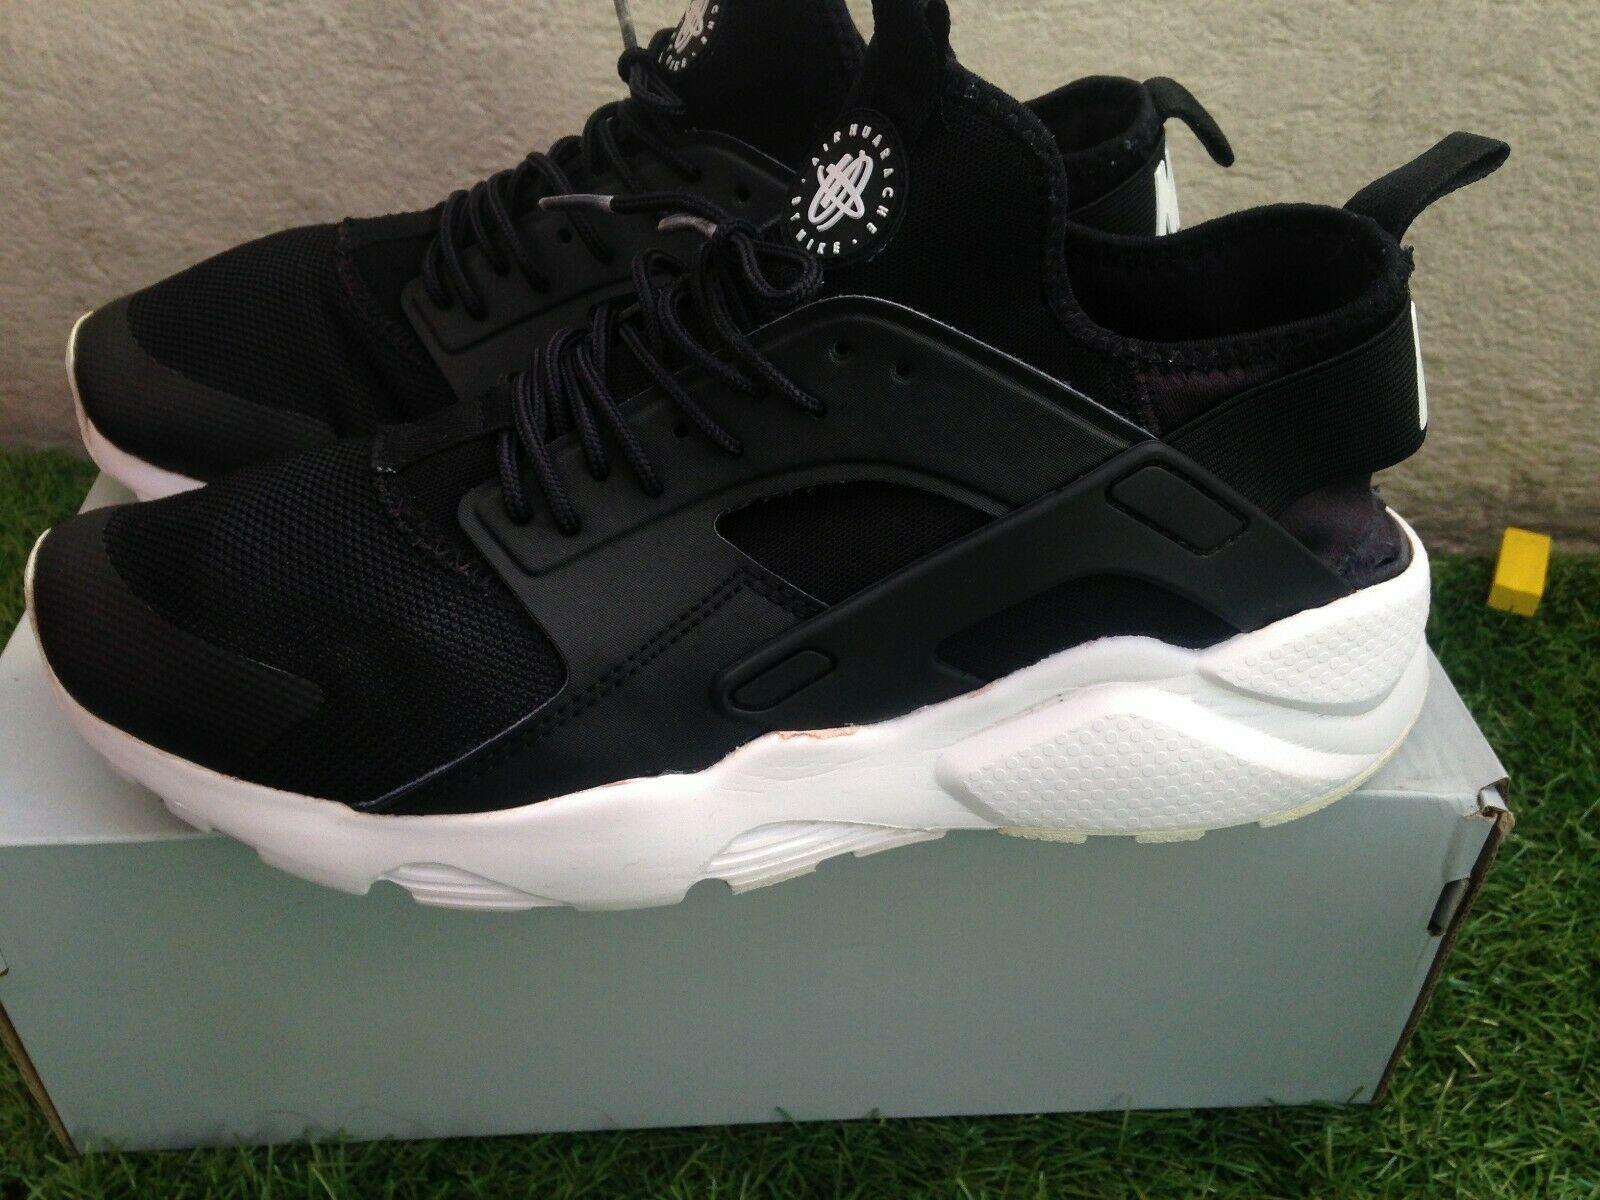 Bon Homme Noires Occasion 44 Baskets Nike Taille Air Huarache Ultra wXOP8Nn0k